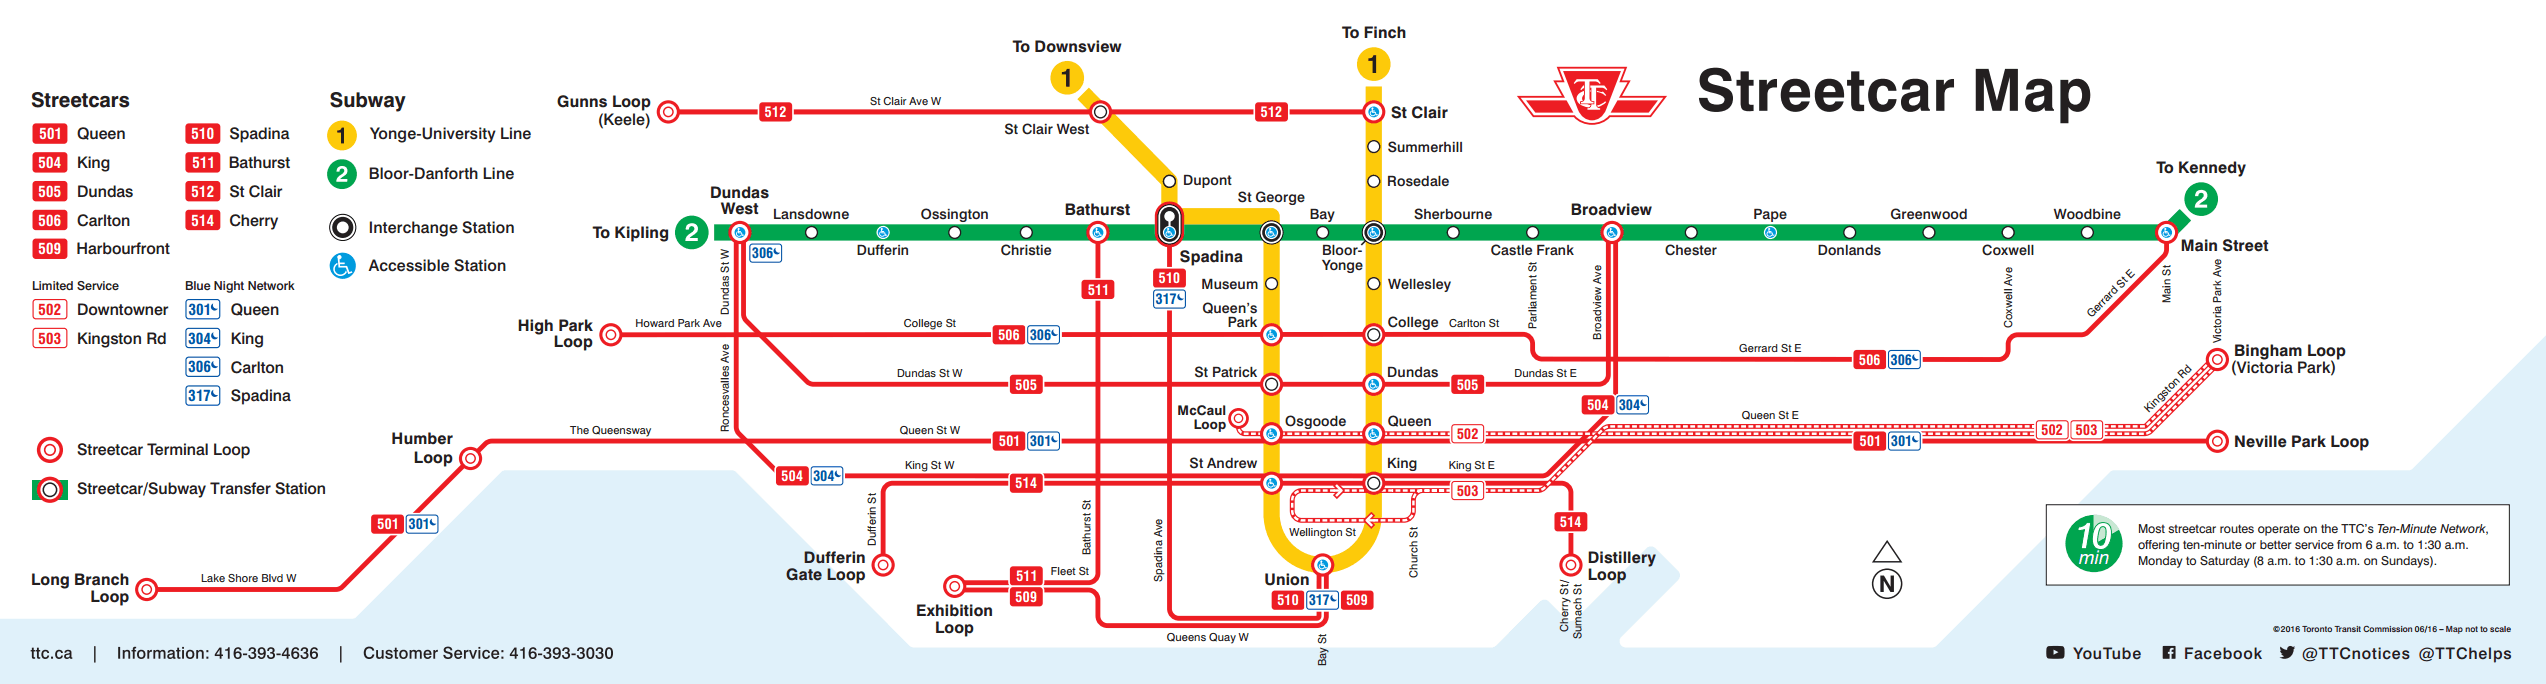 Toronto TTC Streetcar Map - Get Around Toronto